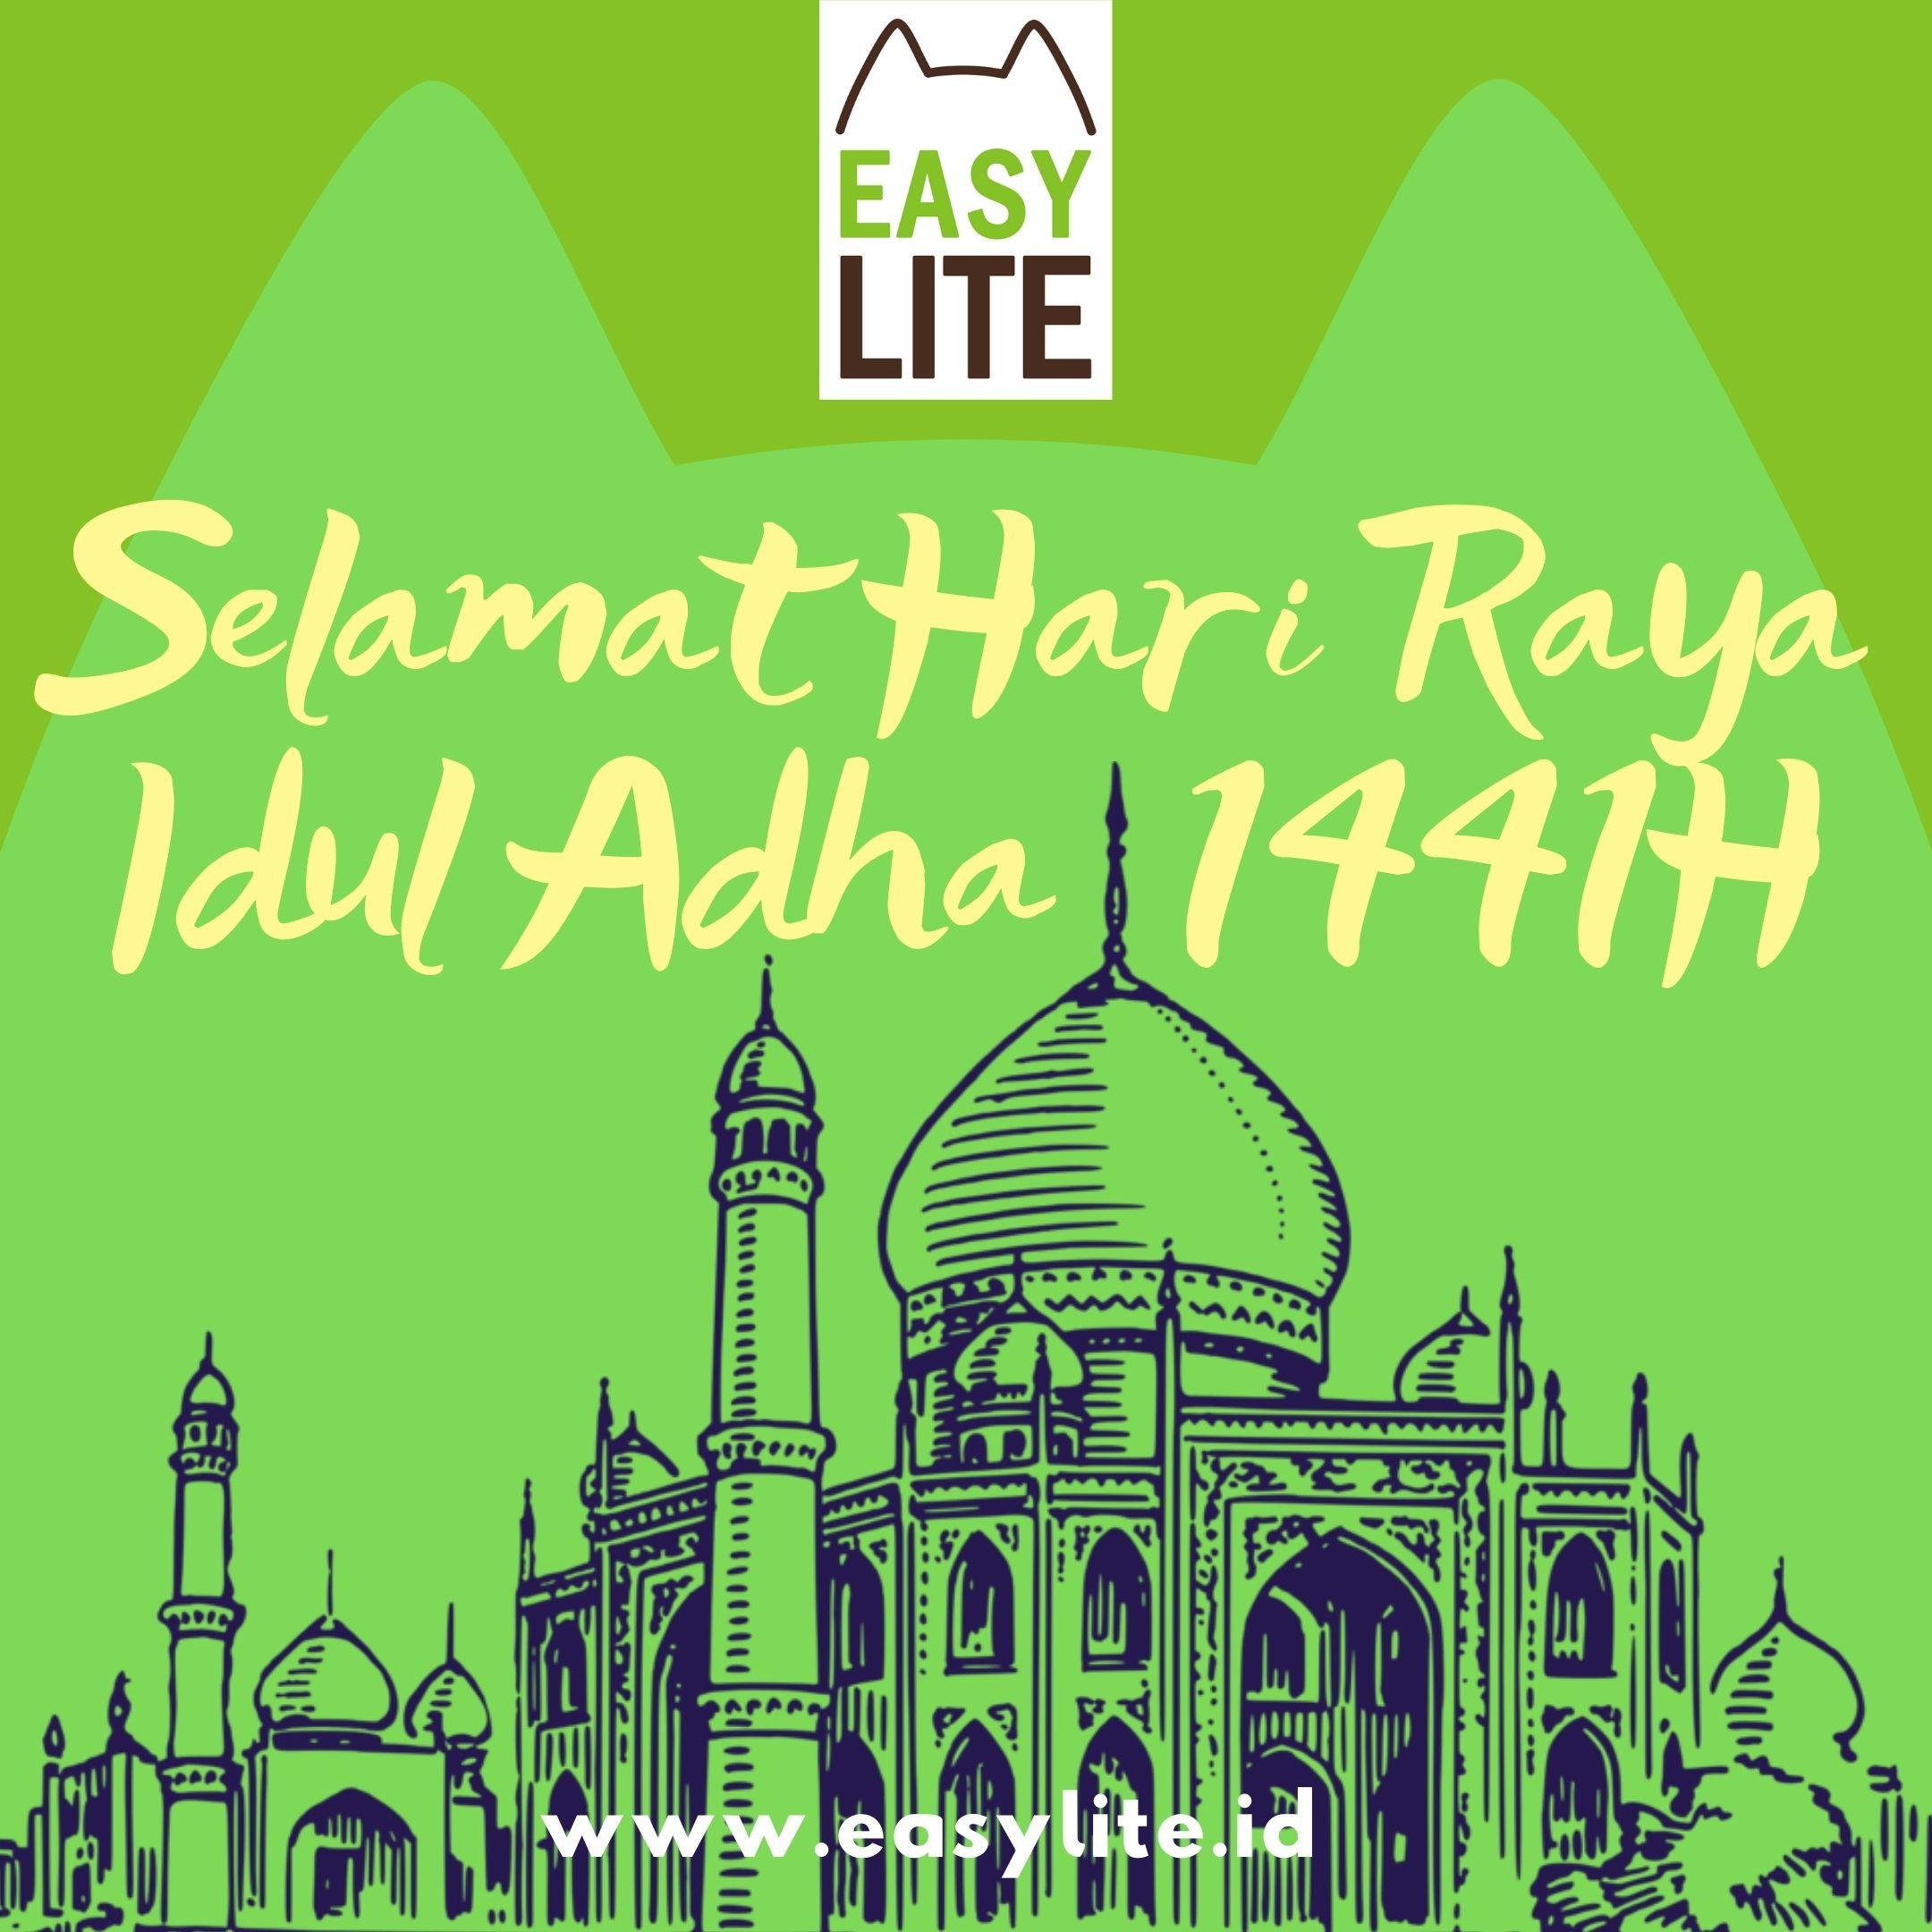 Selamat Hari Raya Idul Adha 1441H